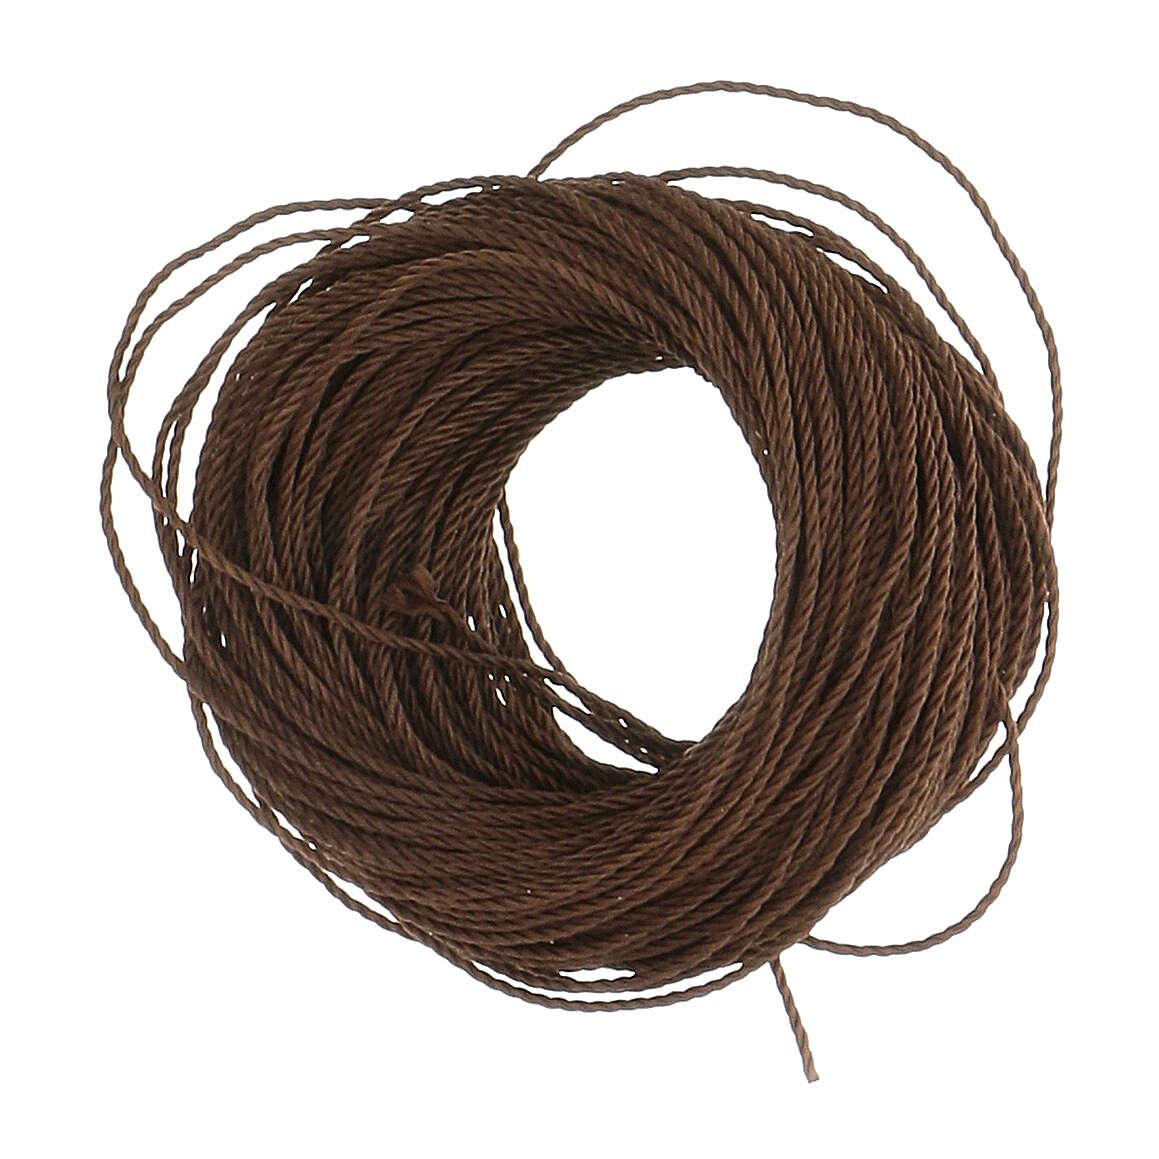 Corda marrone per rosari fai da te (12 rosari) 4